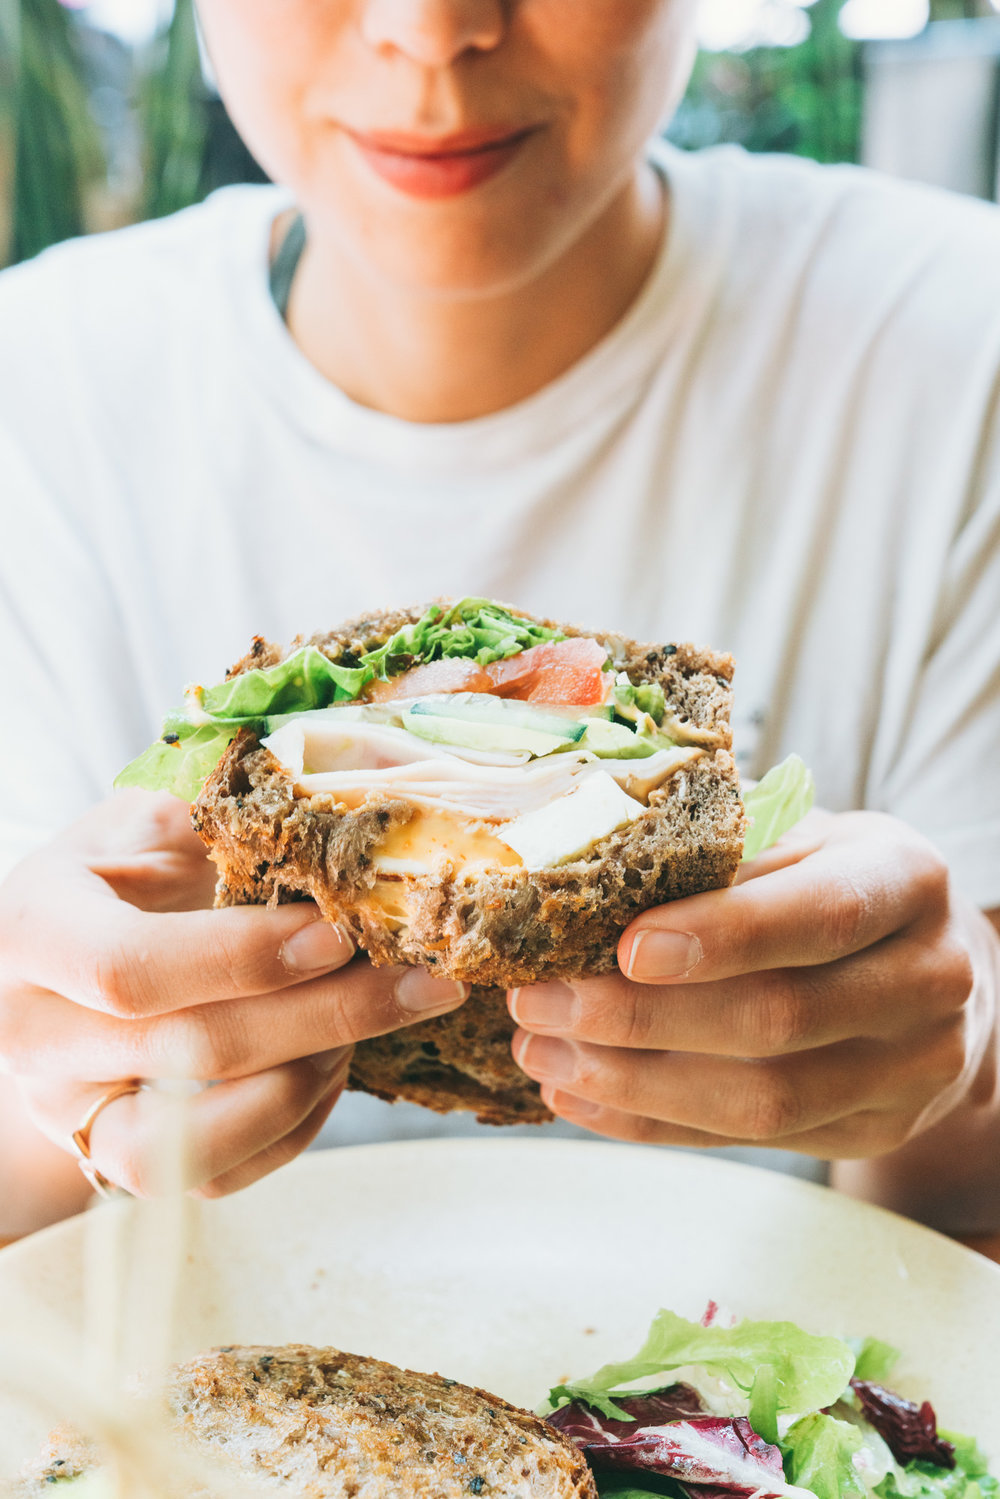 sandwiches and smiles at belmondo